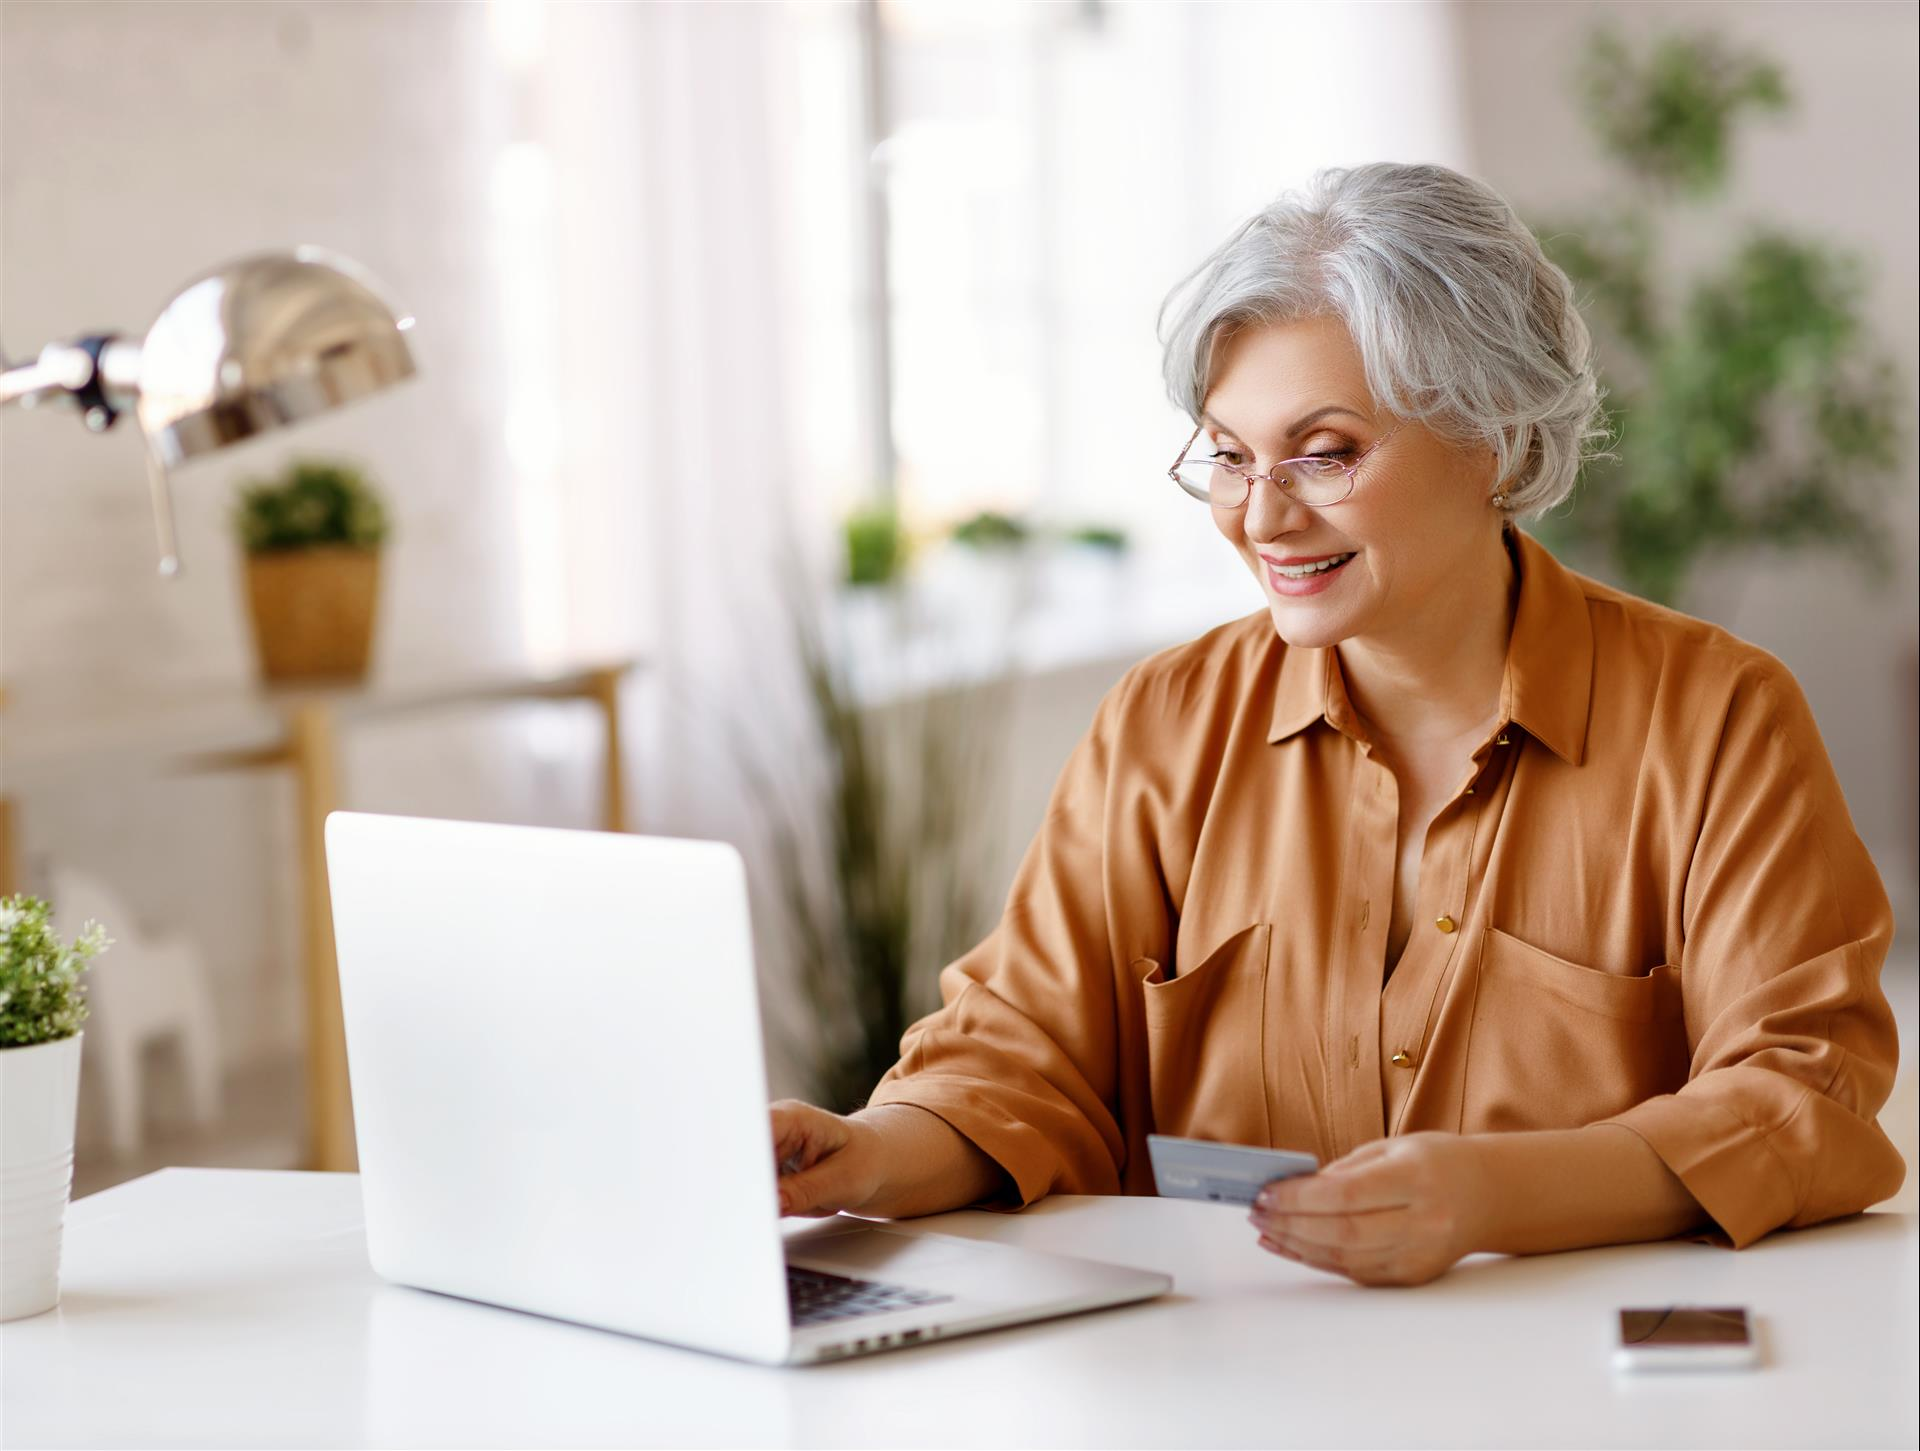 6 Fun Ways to Make Some Extra Cash Online